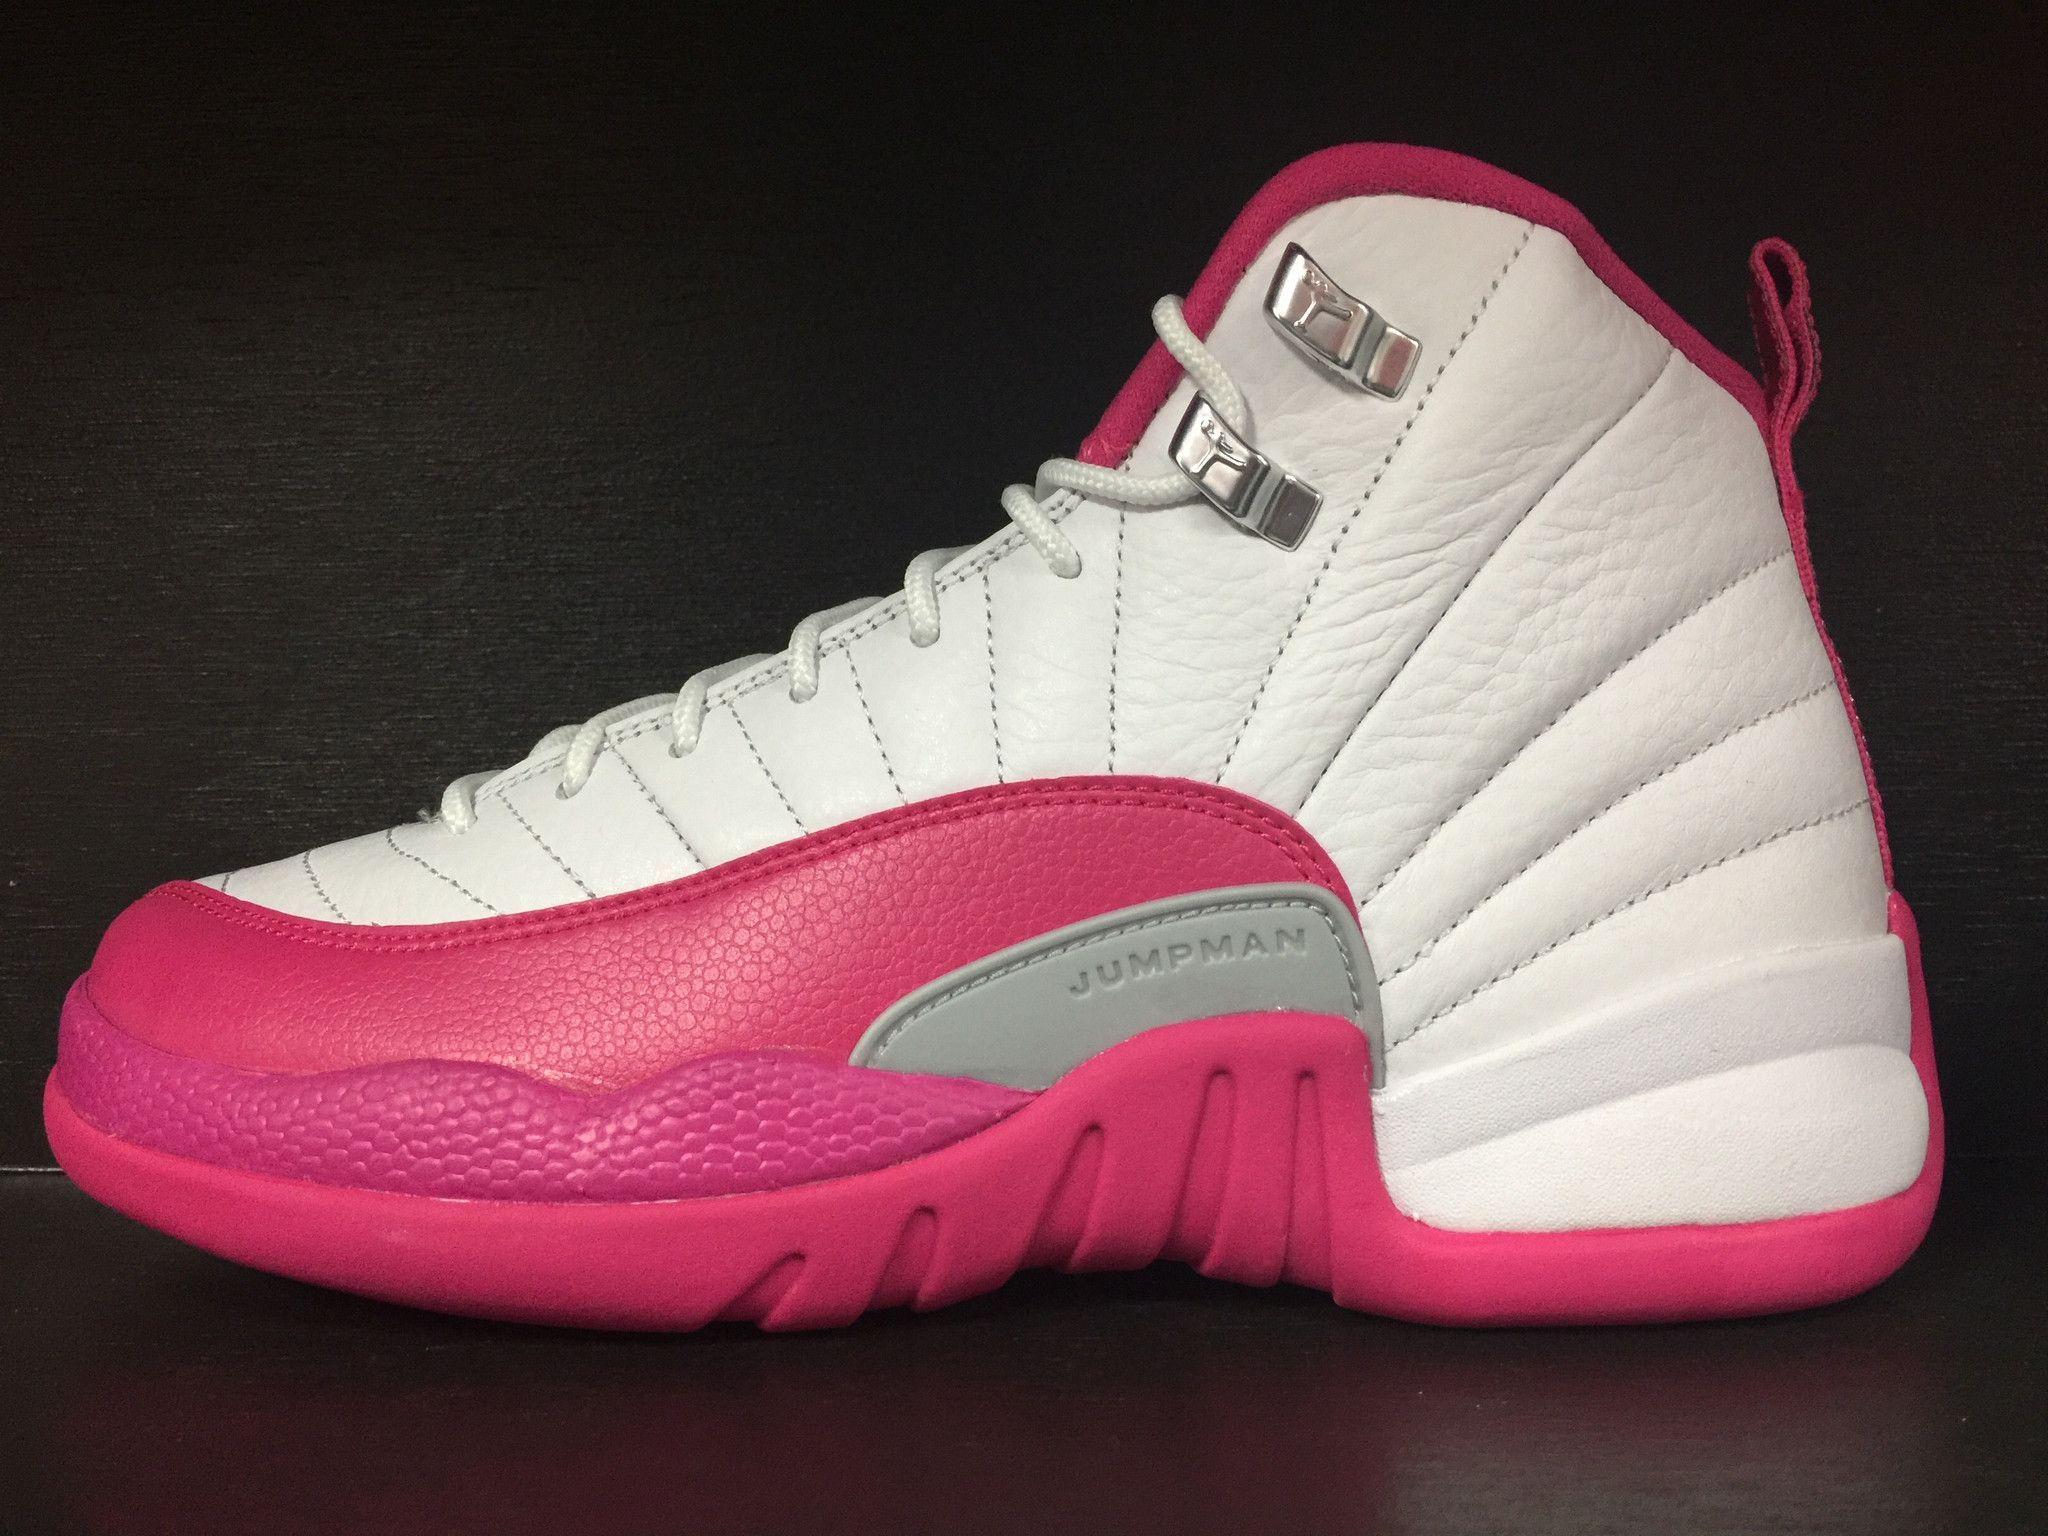 free shipping a1913 3de10 Air Jordan 12 GS 'Dynamic Pink' | JORDANS | Jordans, Air ...